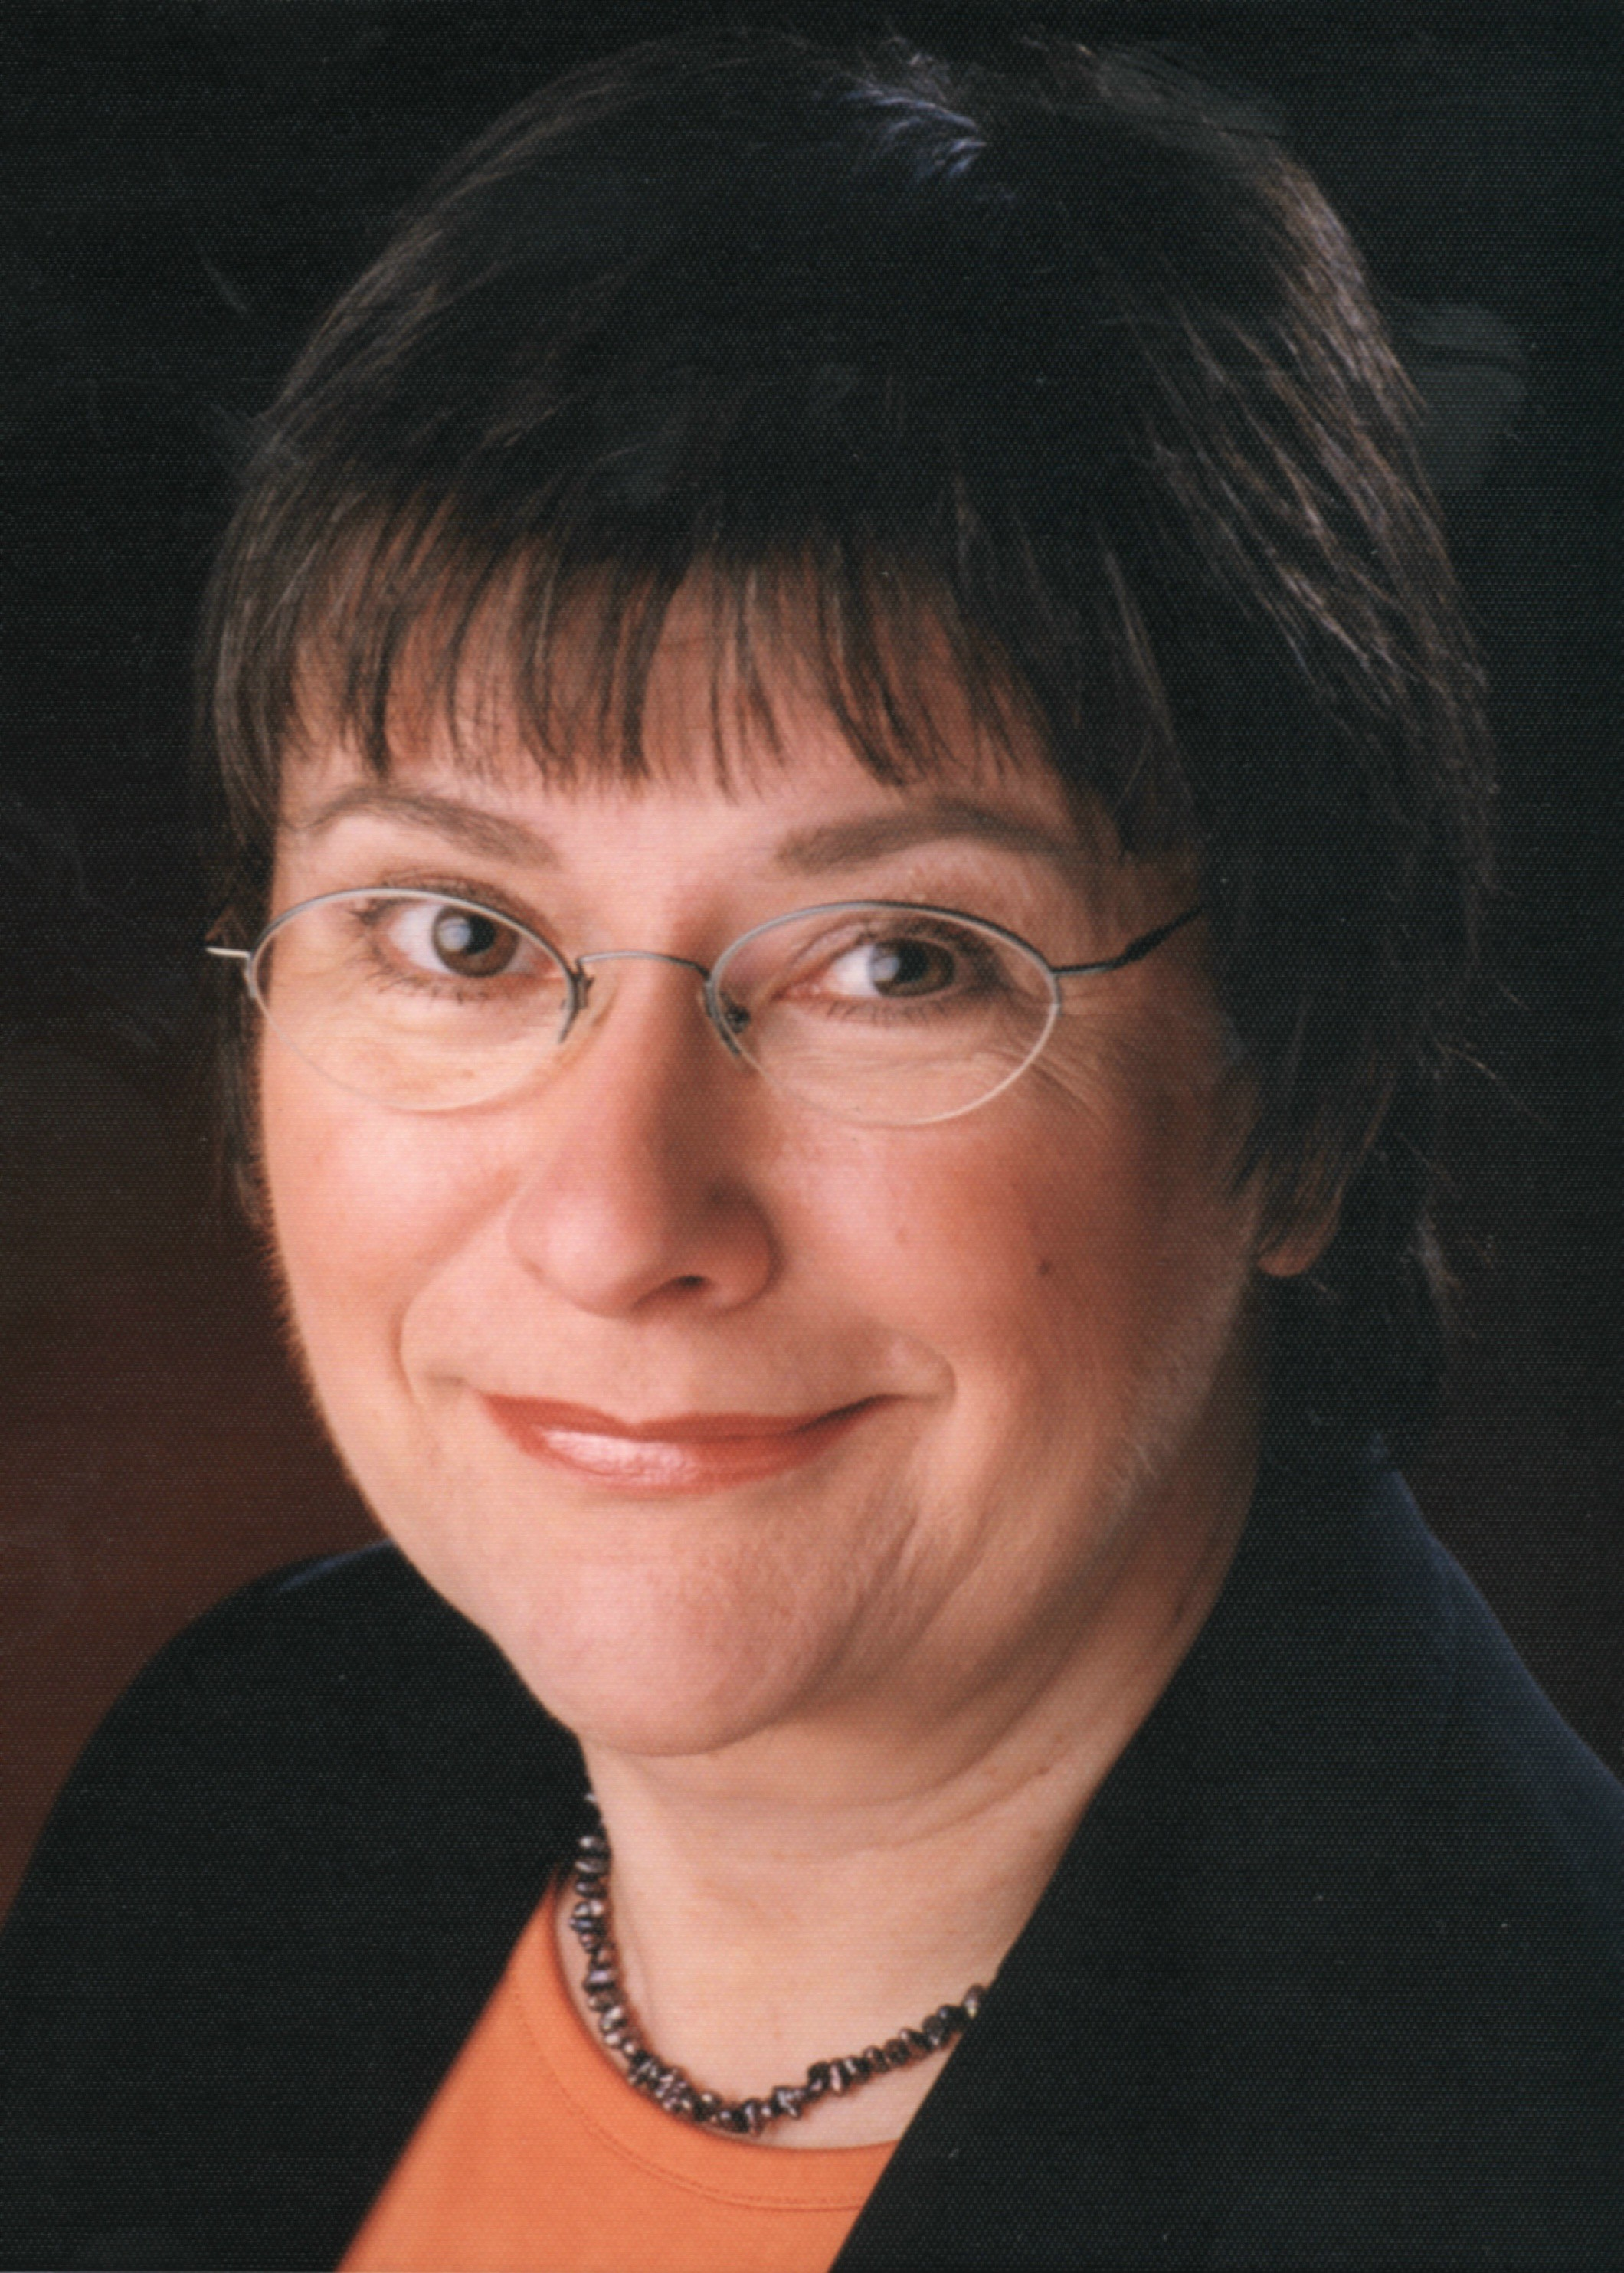 Prof. Dr. Ursula Carle